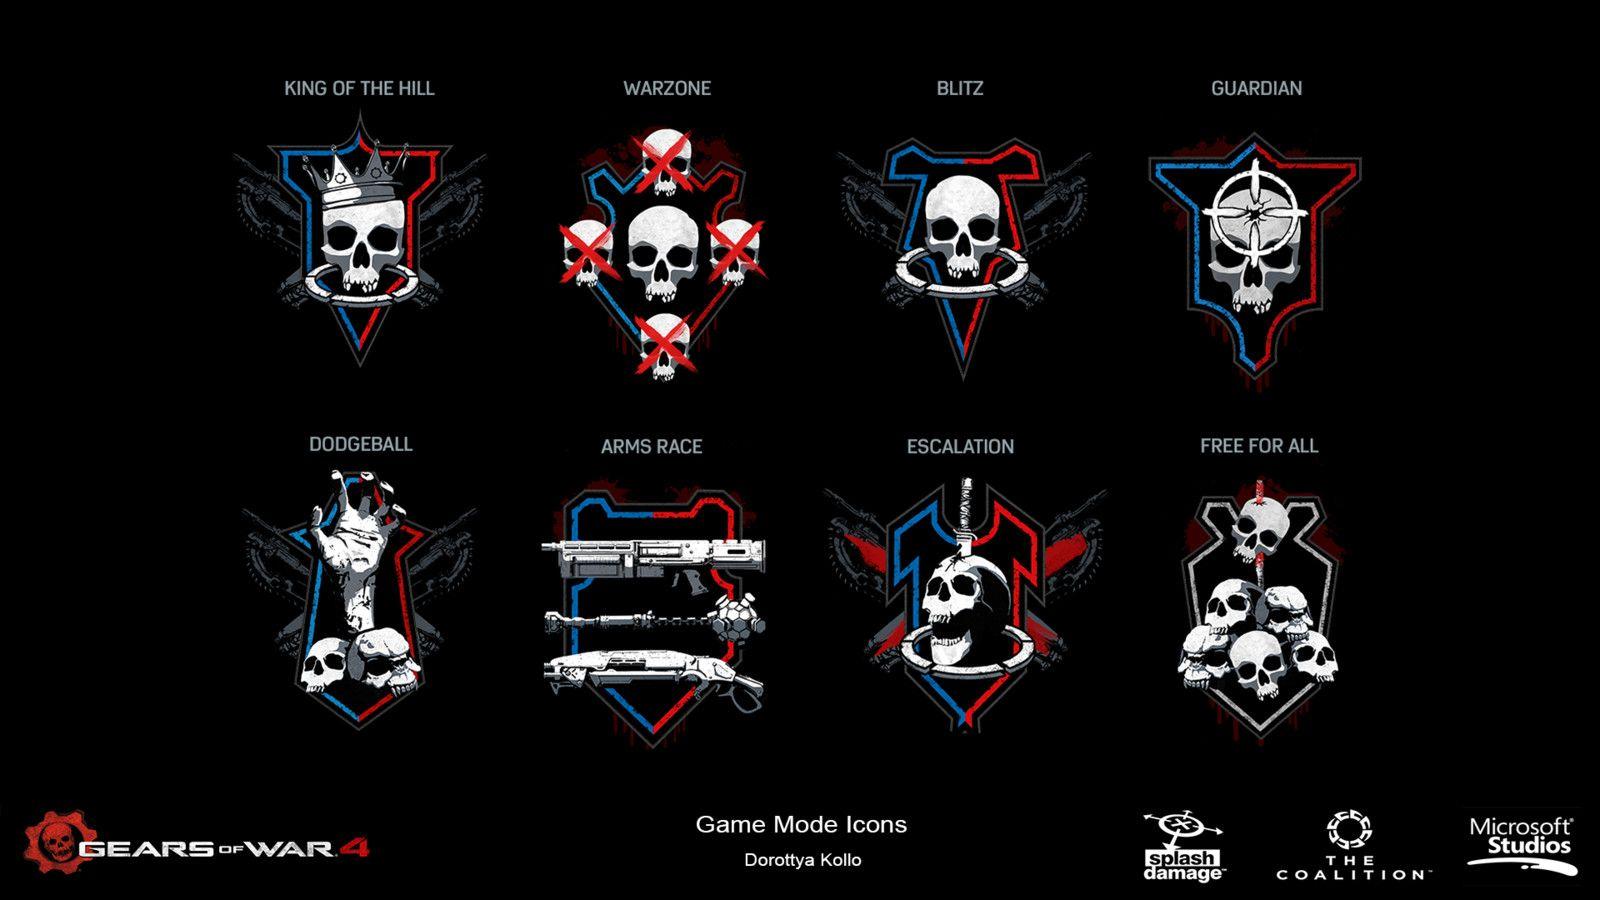 Gears Of War 4 Game Mode Icons Dorottya Kollo On Artstation At